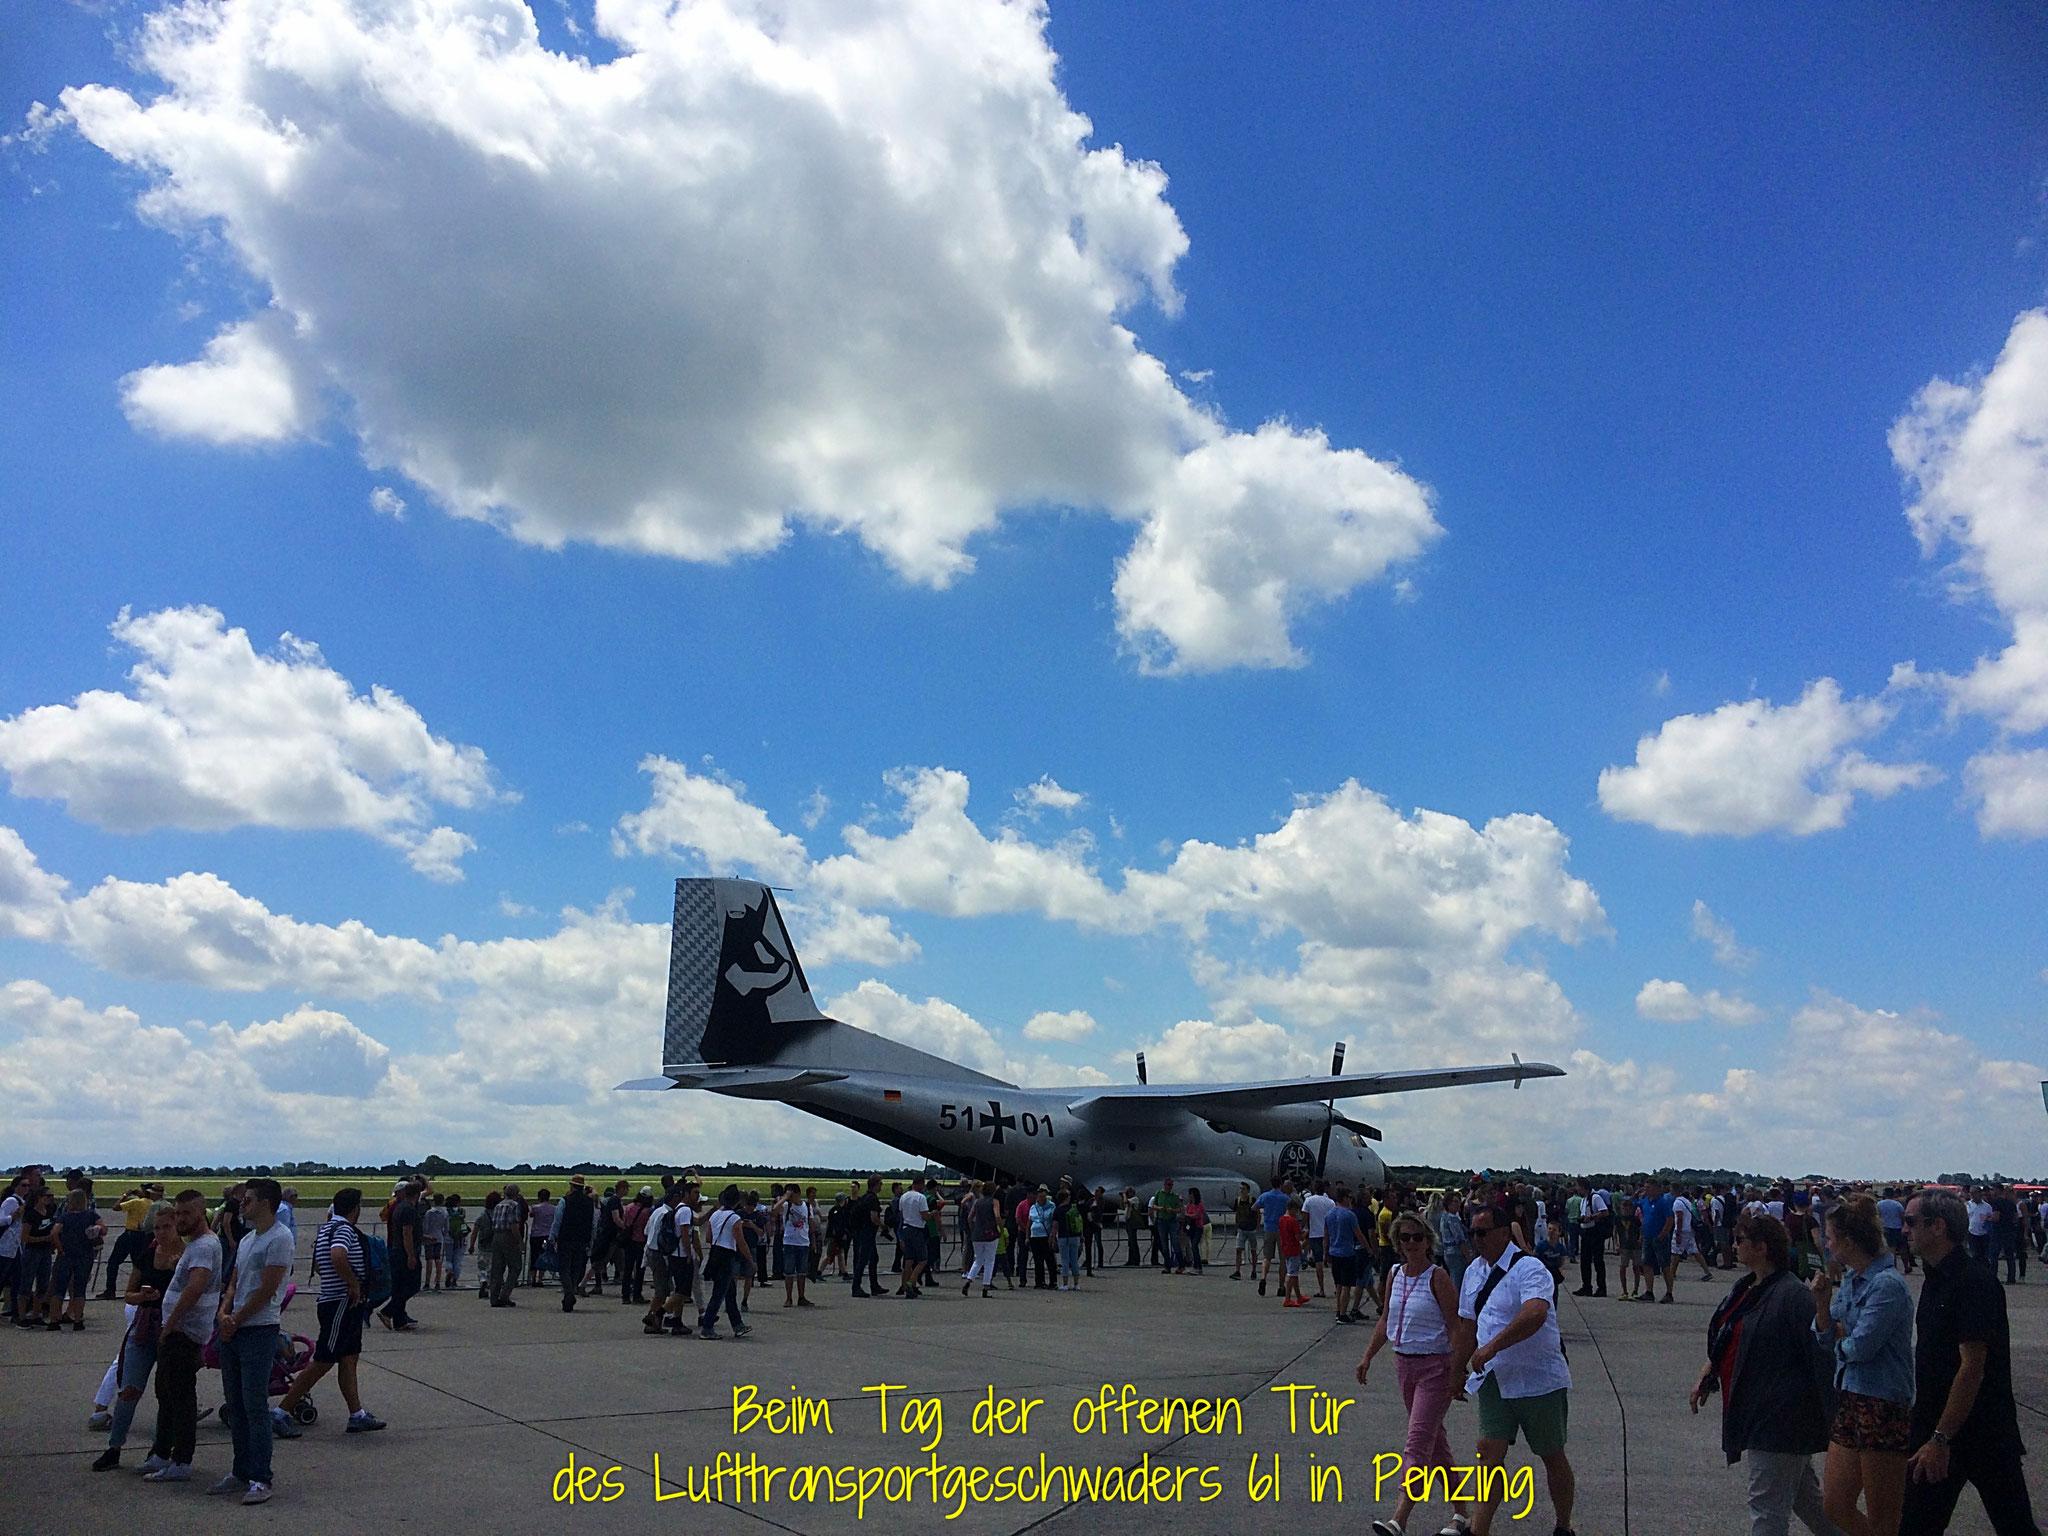 Beim Lufttransportgeschwader 61 in Penzing